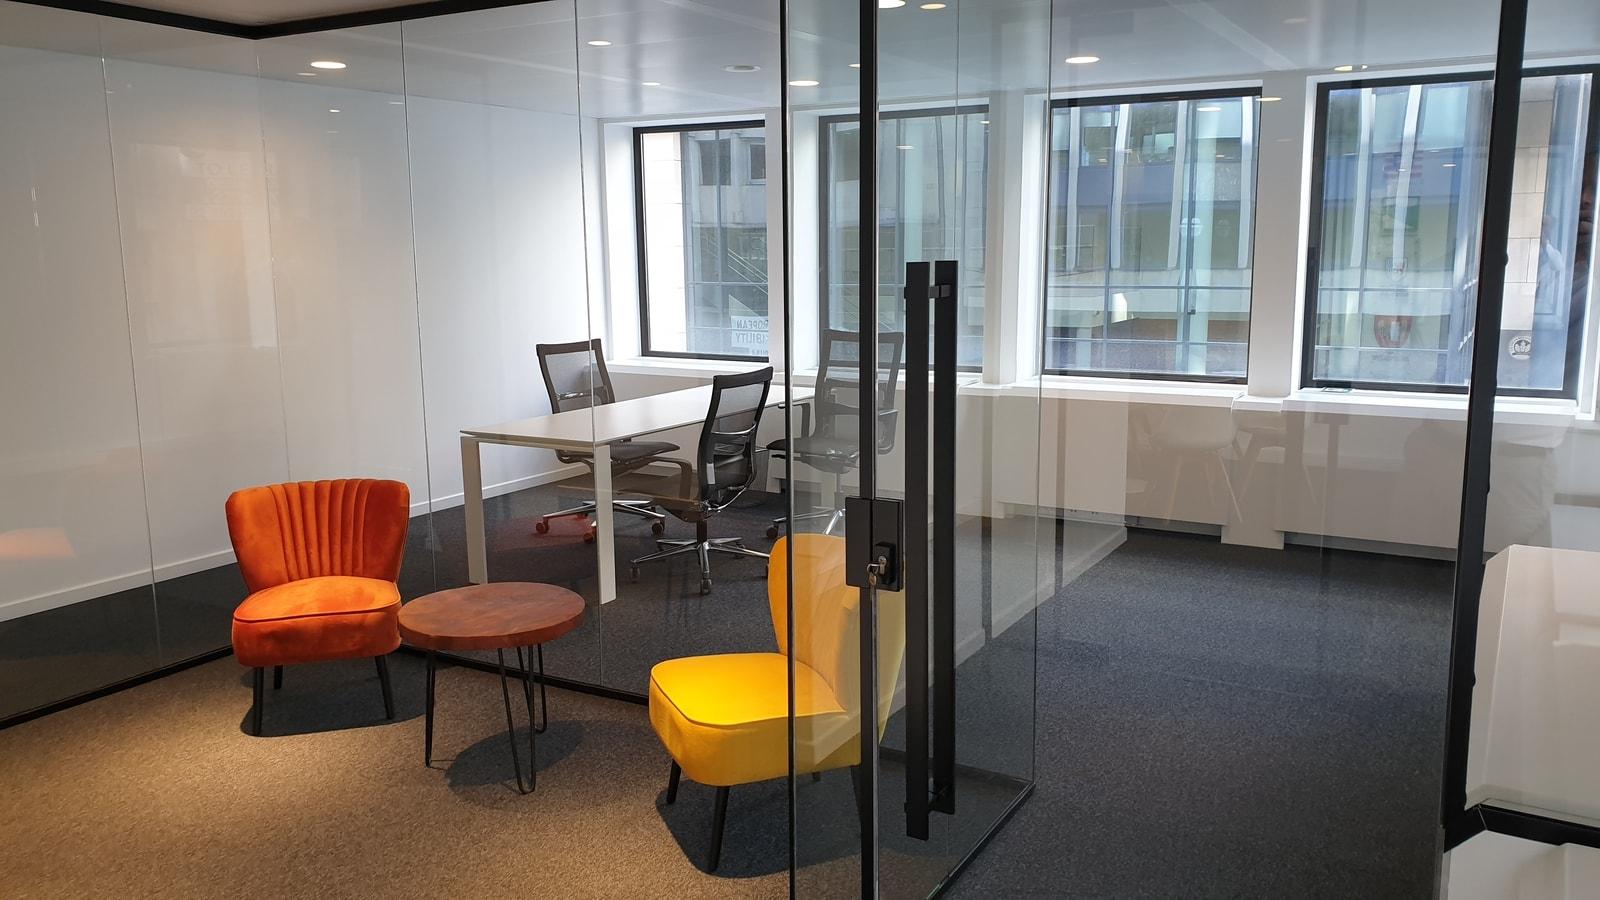 Kantoorunit met bureau en loungestoelen